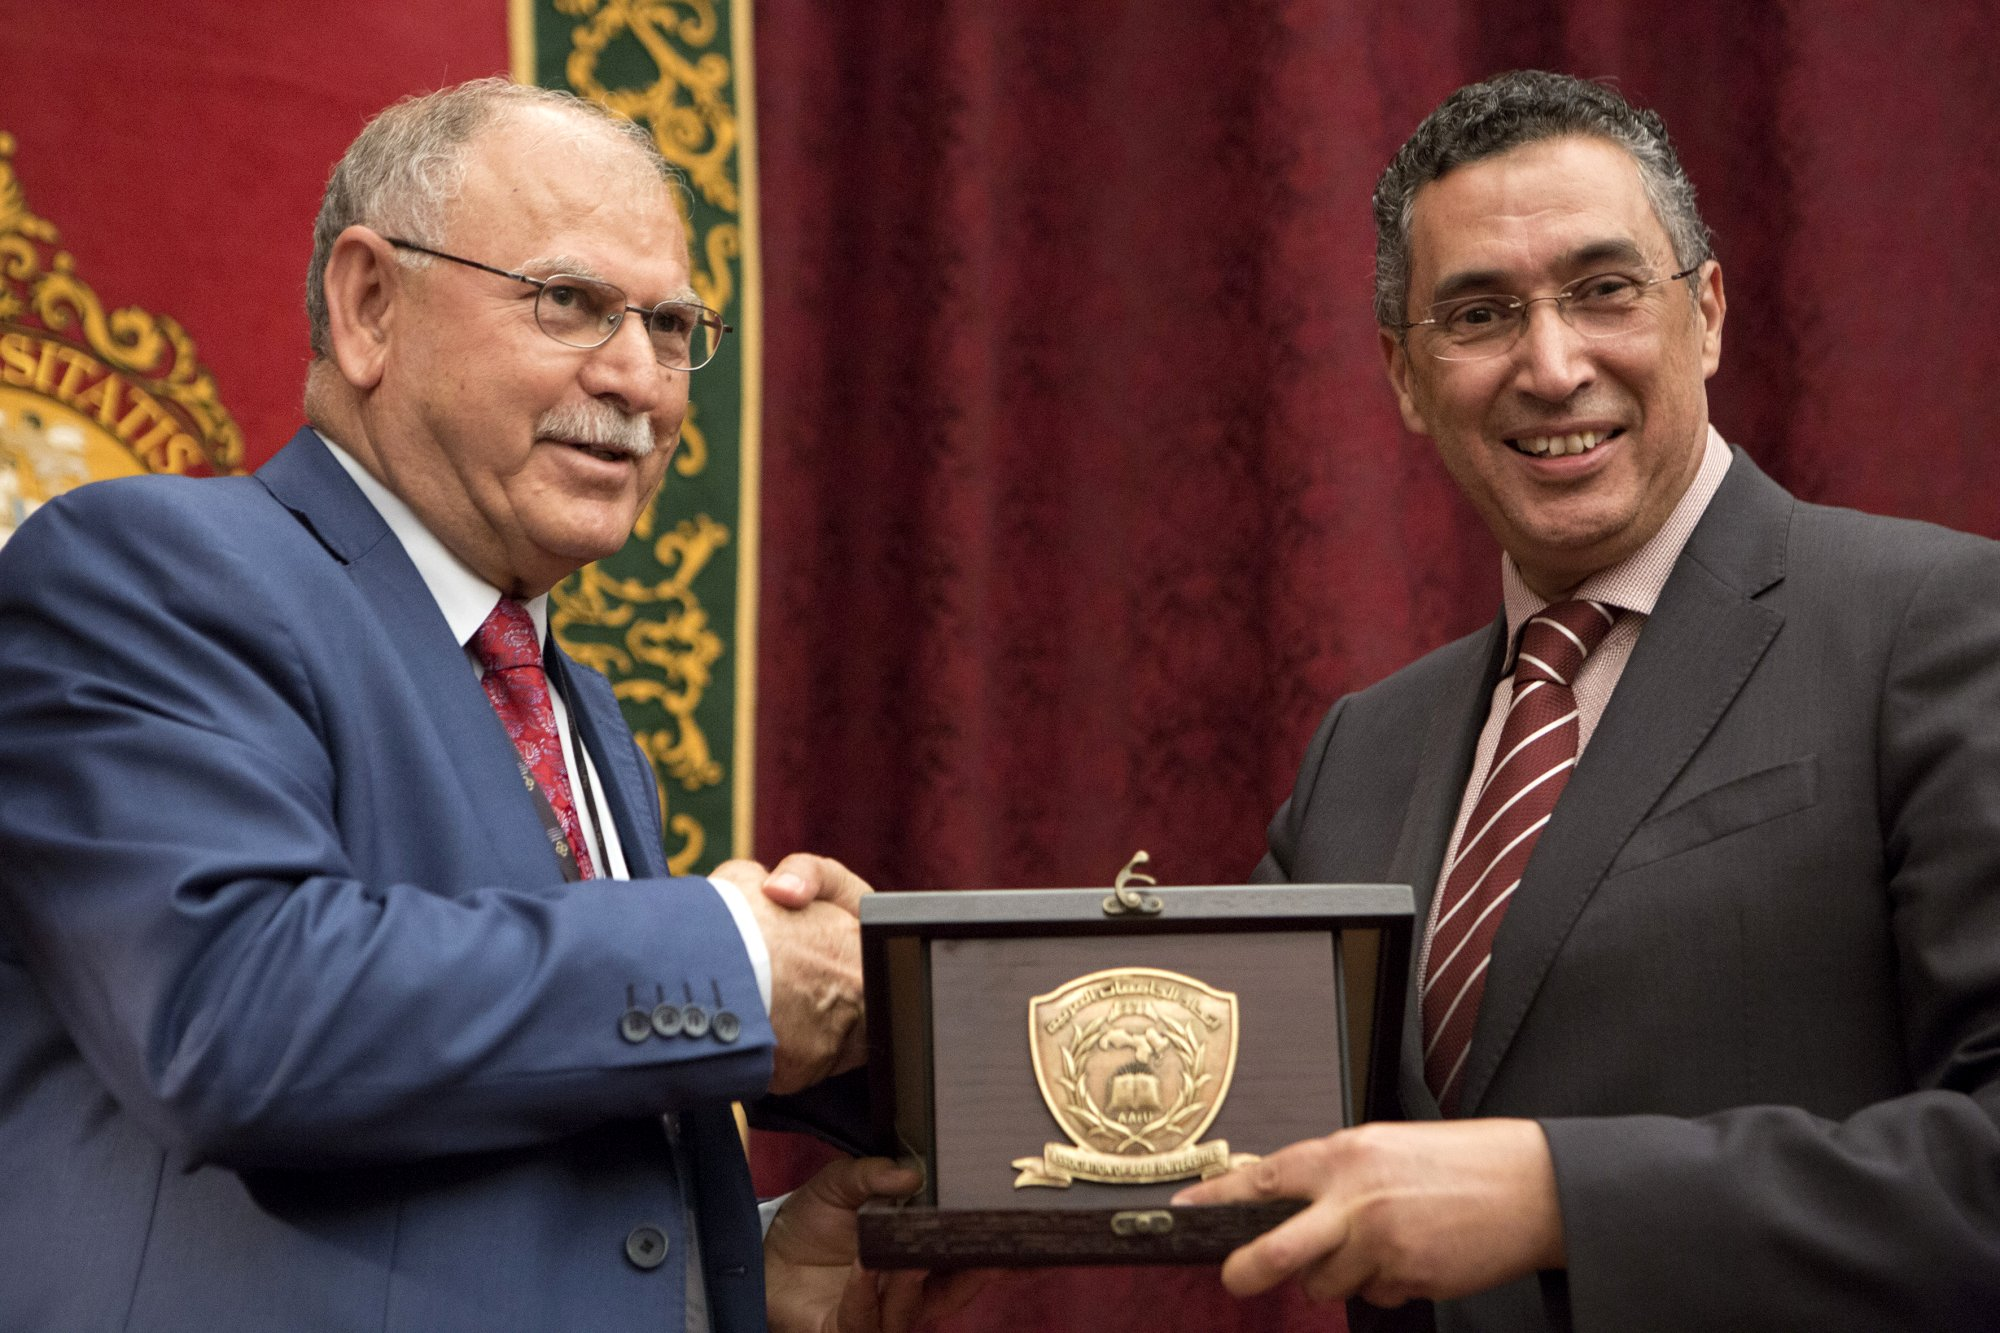 Eng. Anwar El Mezwaghi and Prof. Al Adwan General Secretary of the Association of Arab Universities